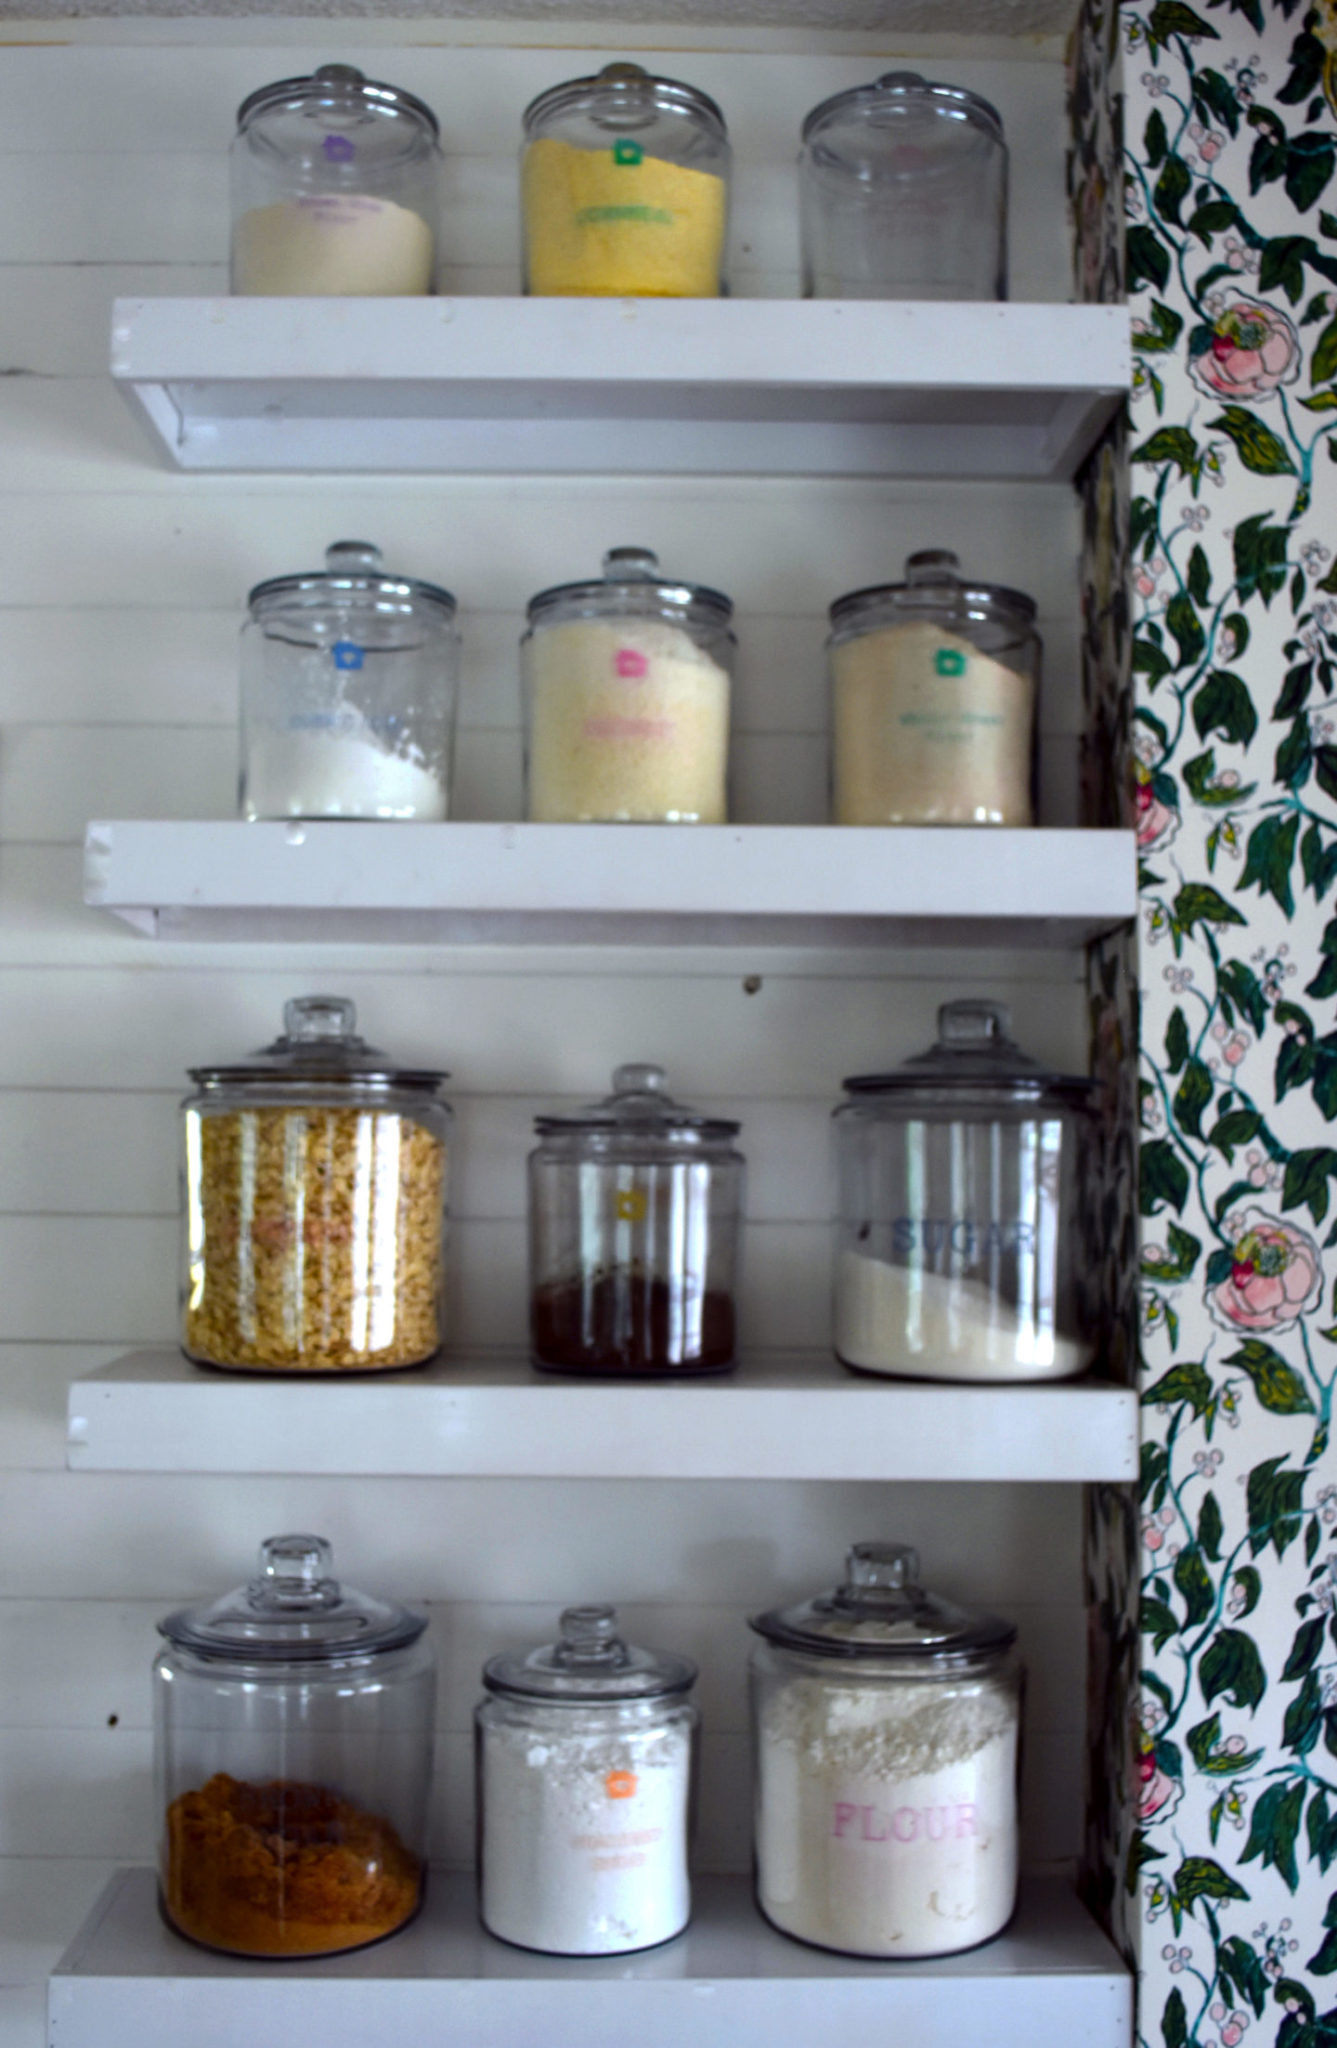 a shelf of glass jar for pantry